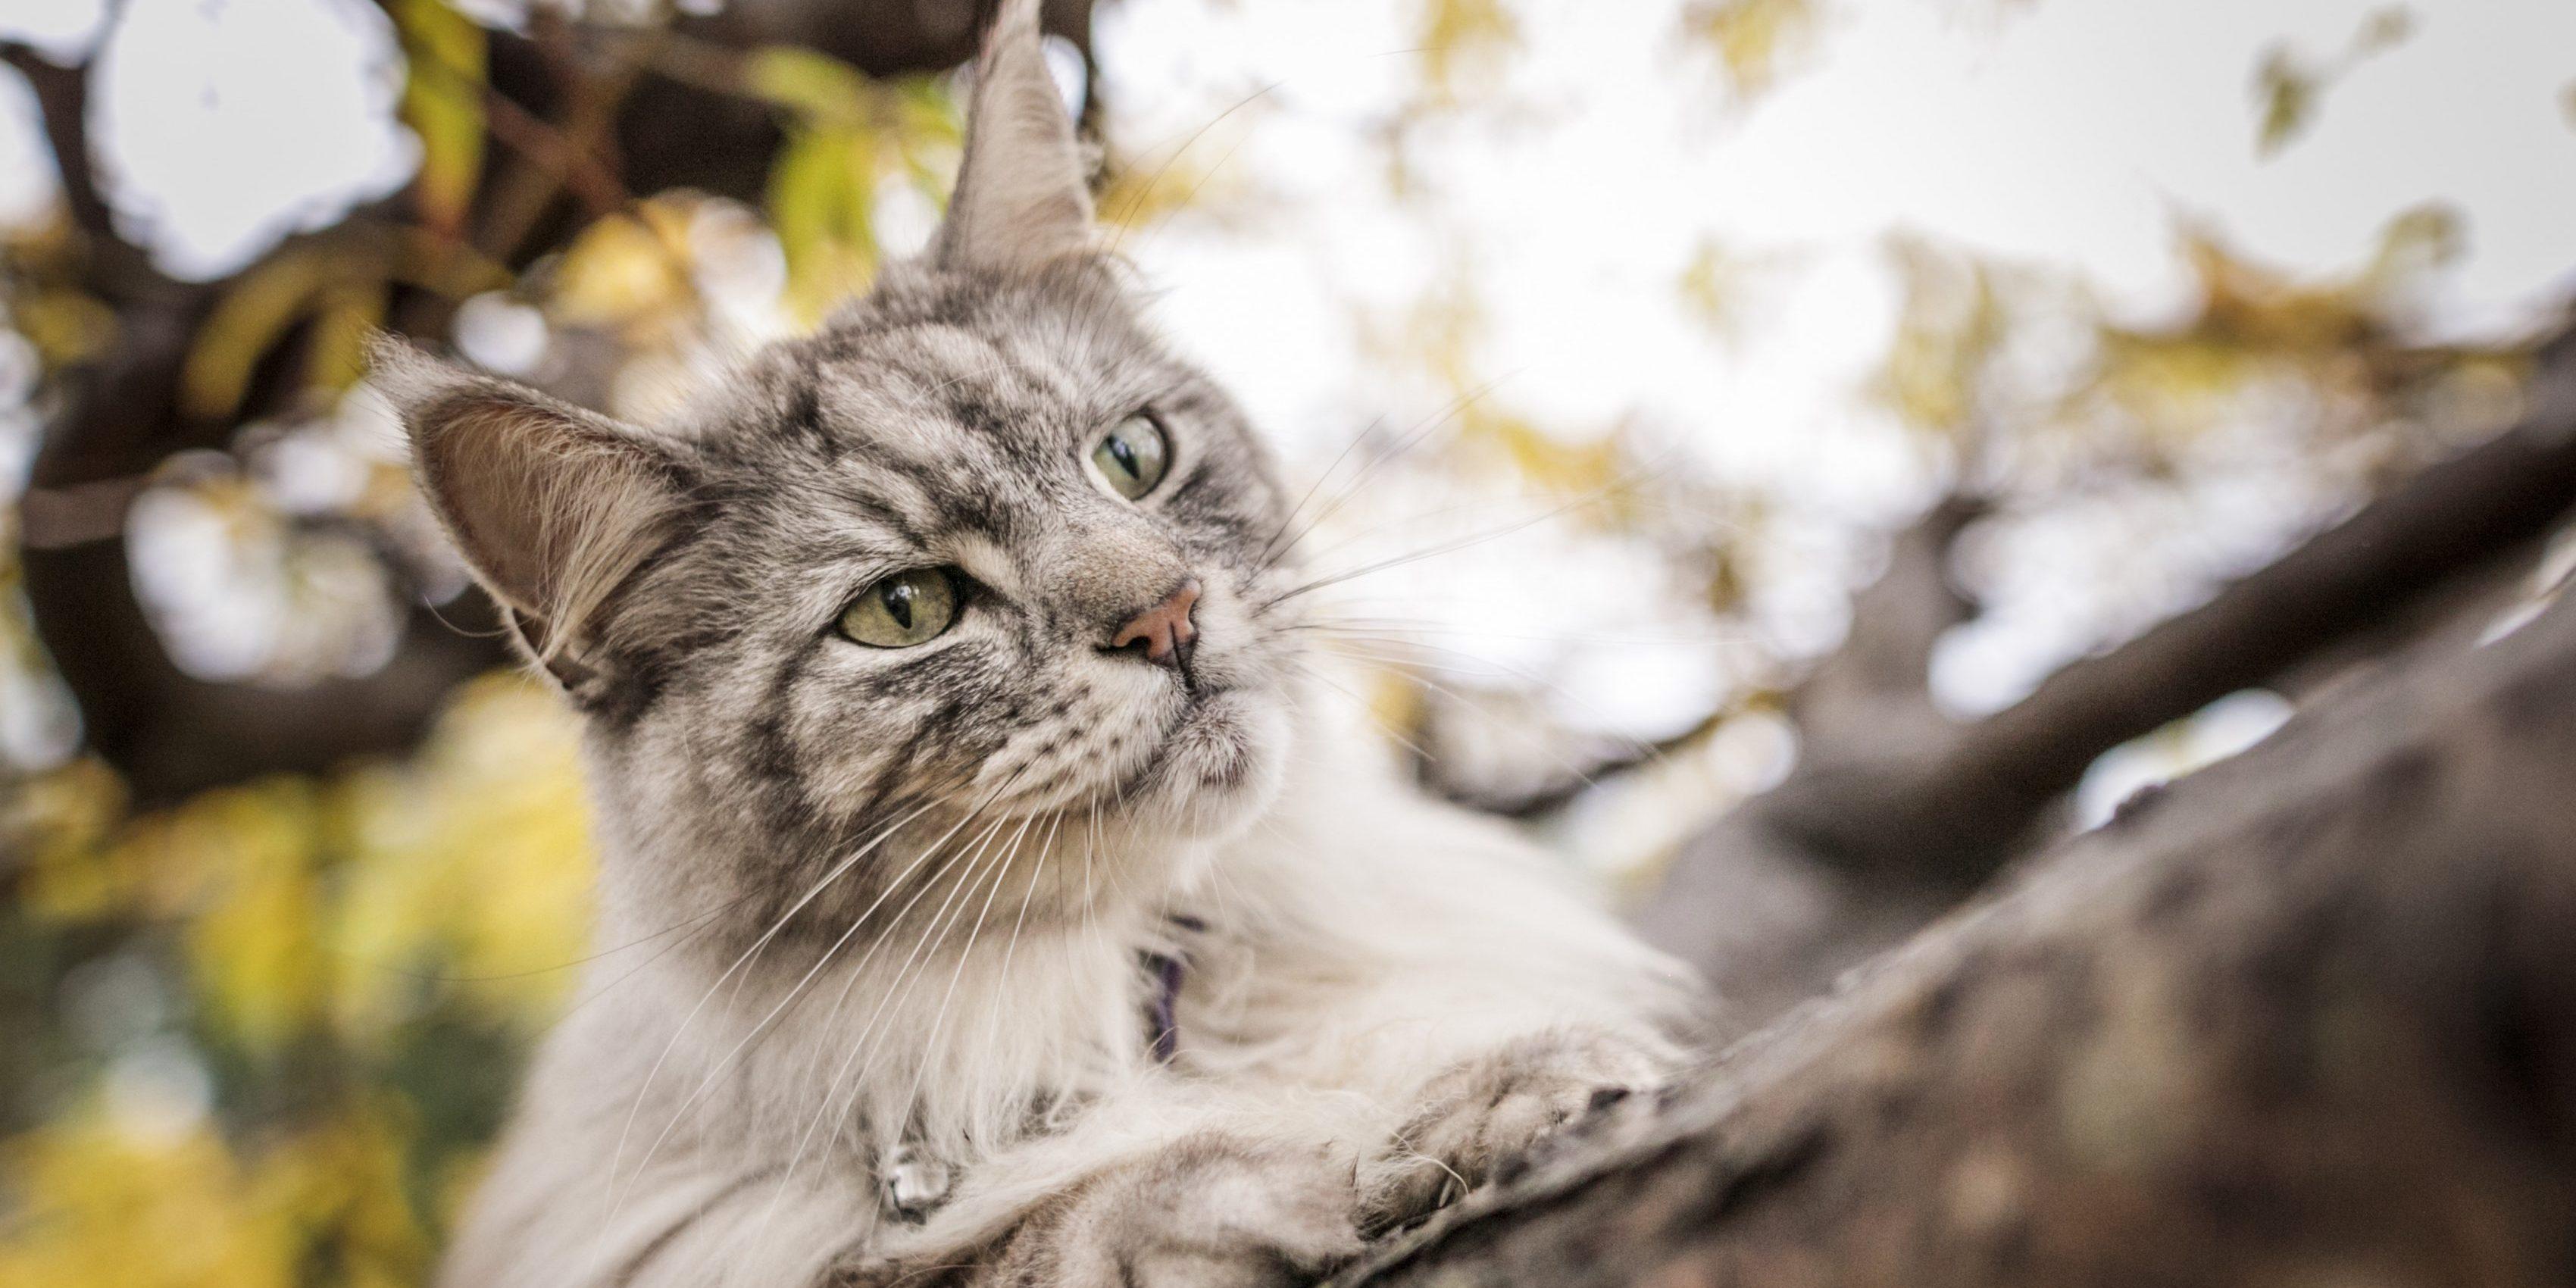 Caninsulin.com cat outside on a tree limb